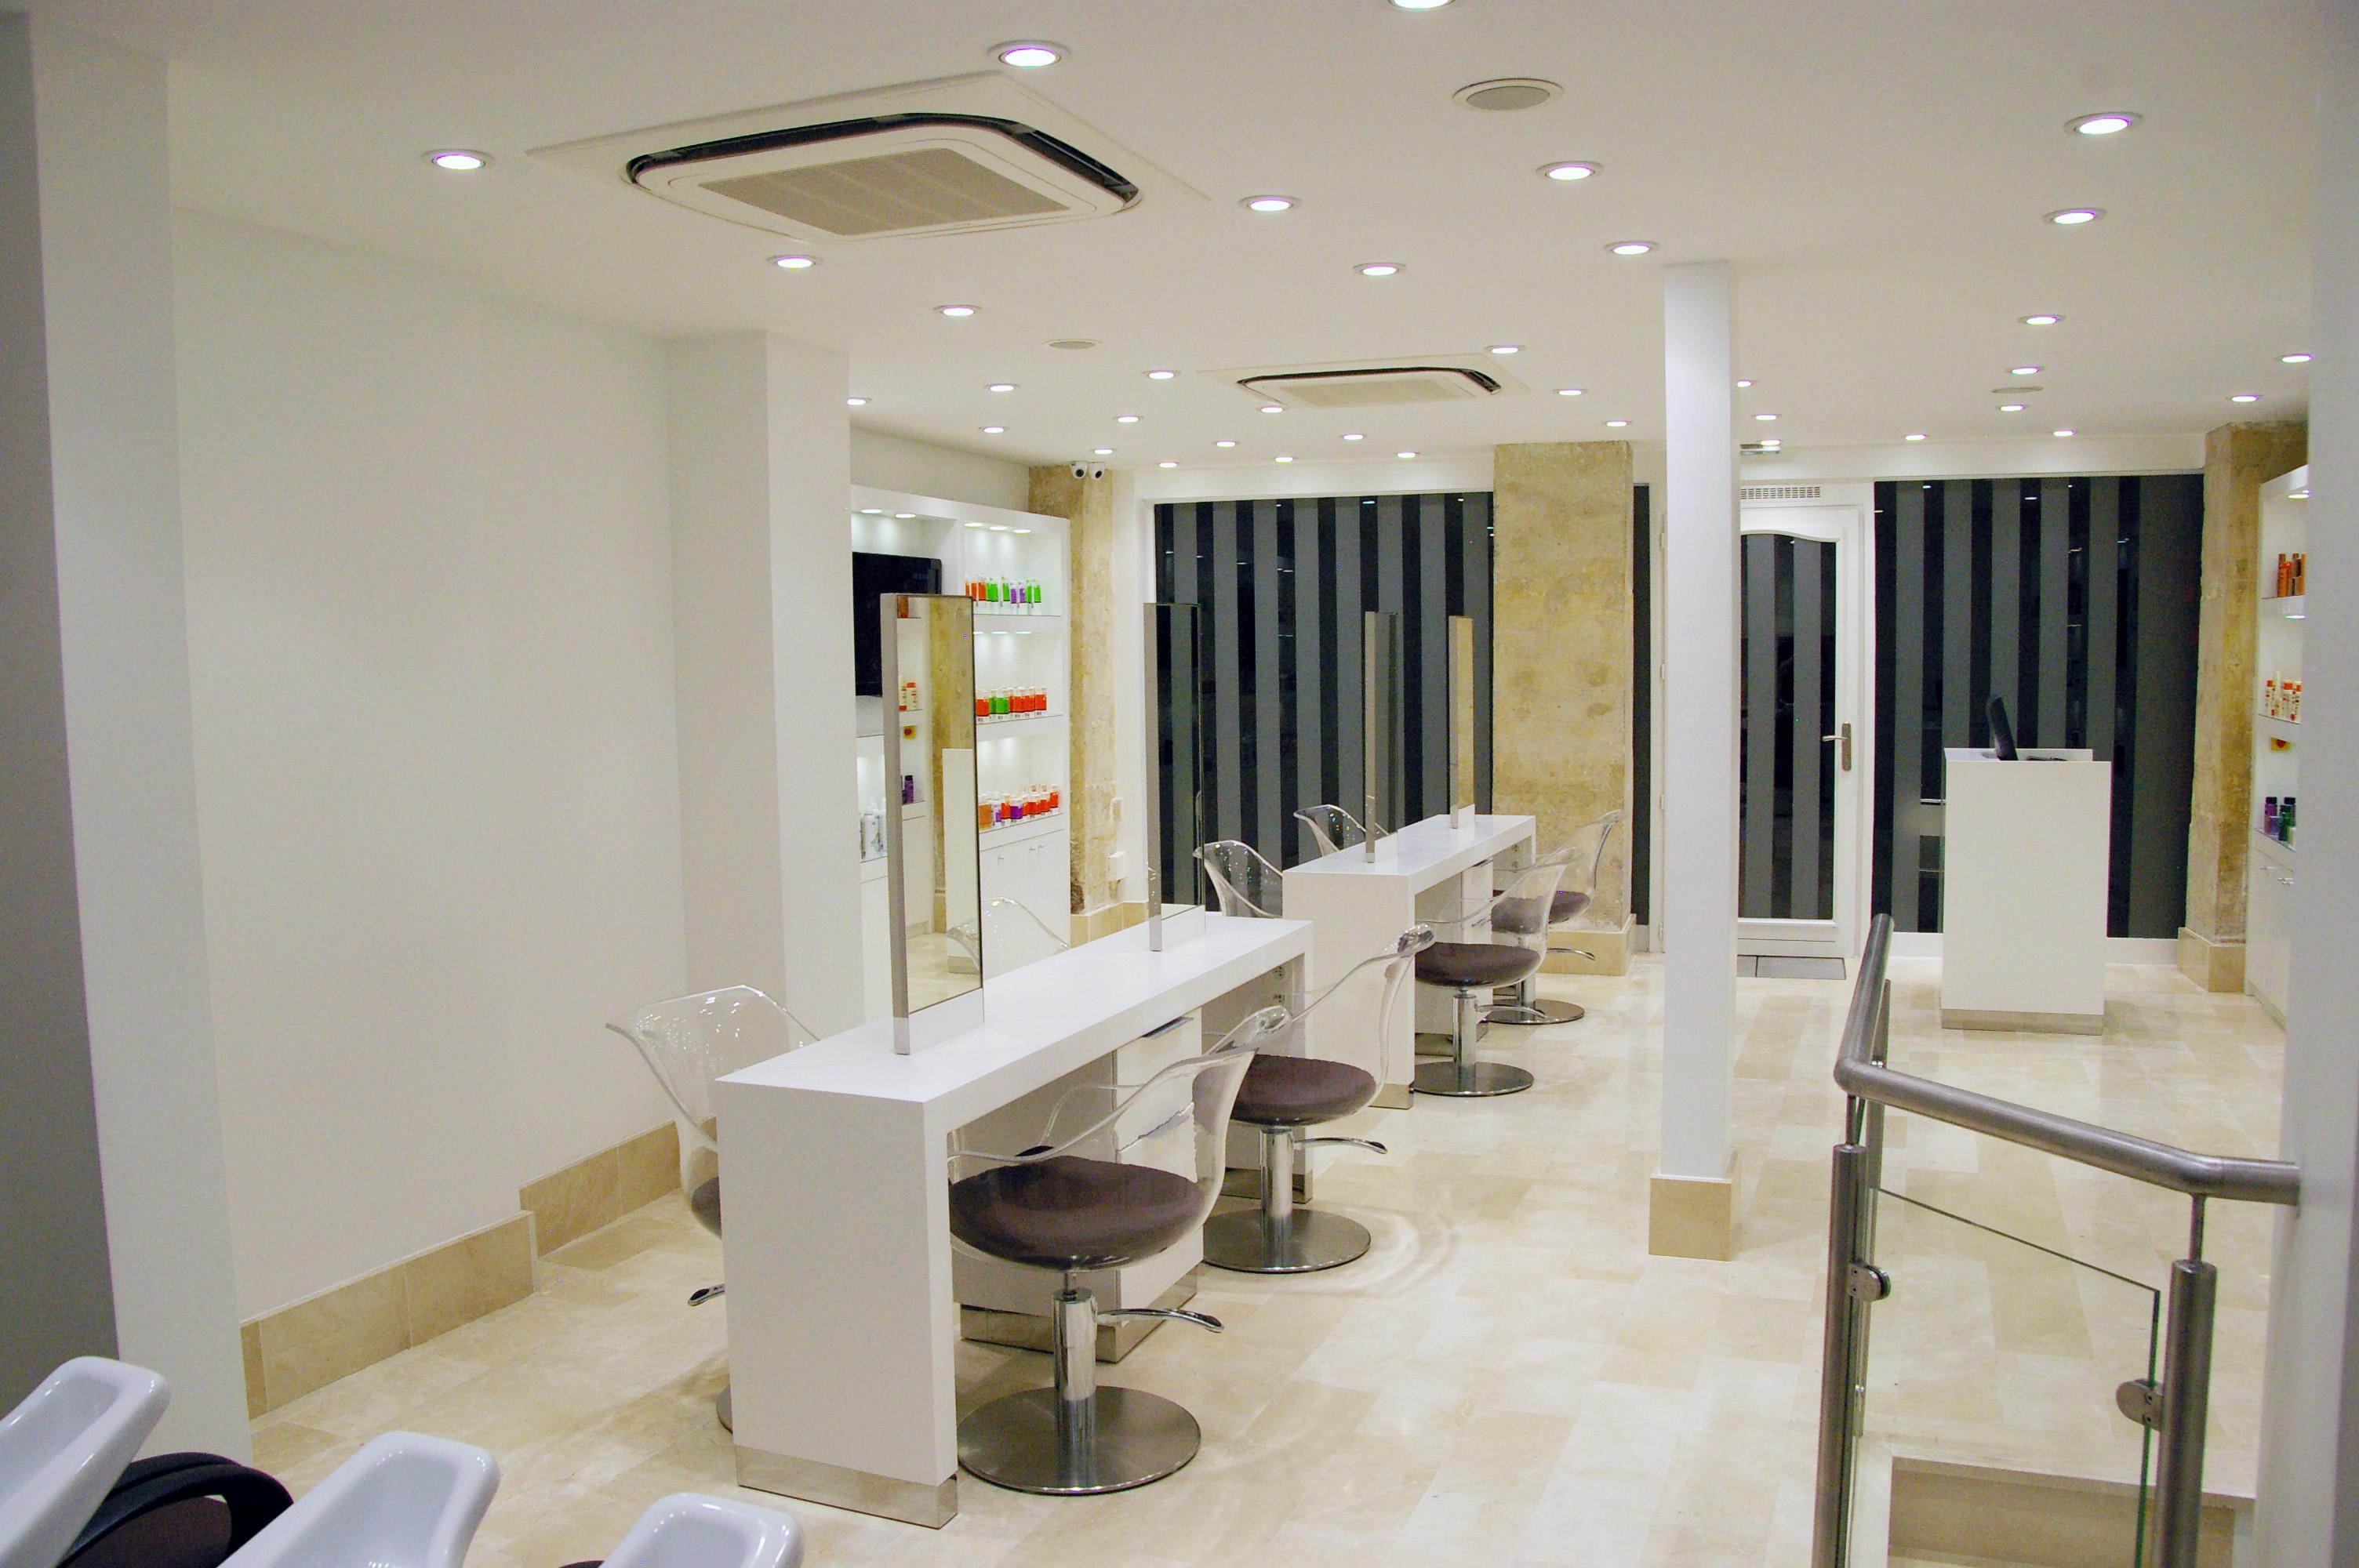 Salon de coiffure biguine prix coiffures f minines et - Prix salon de coiffure ...